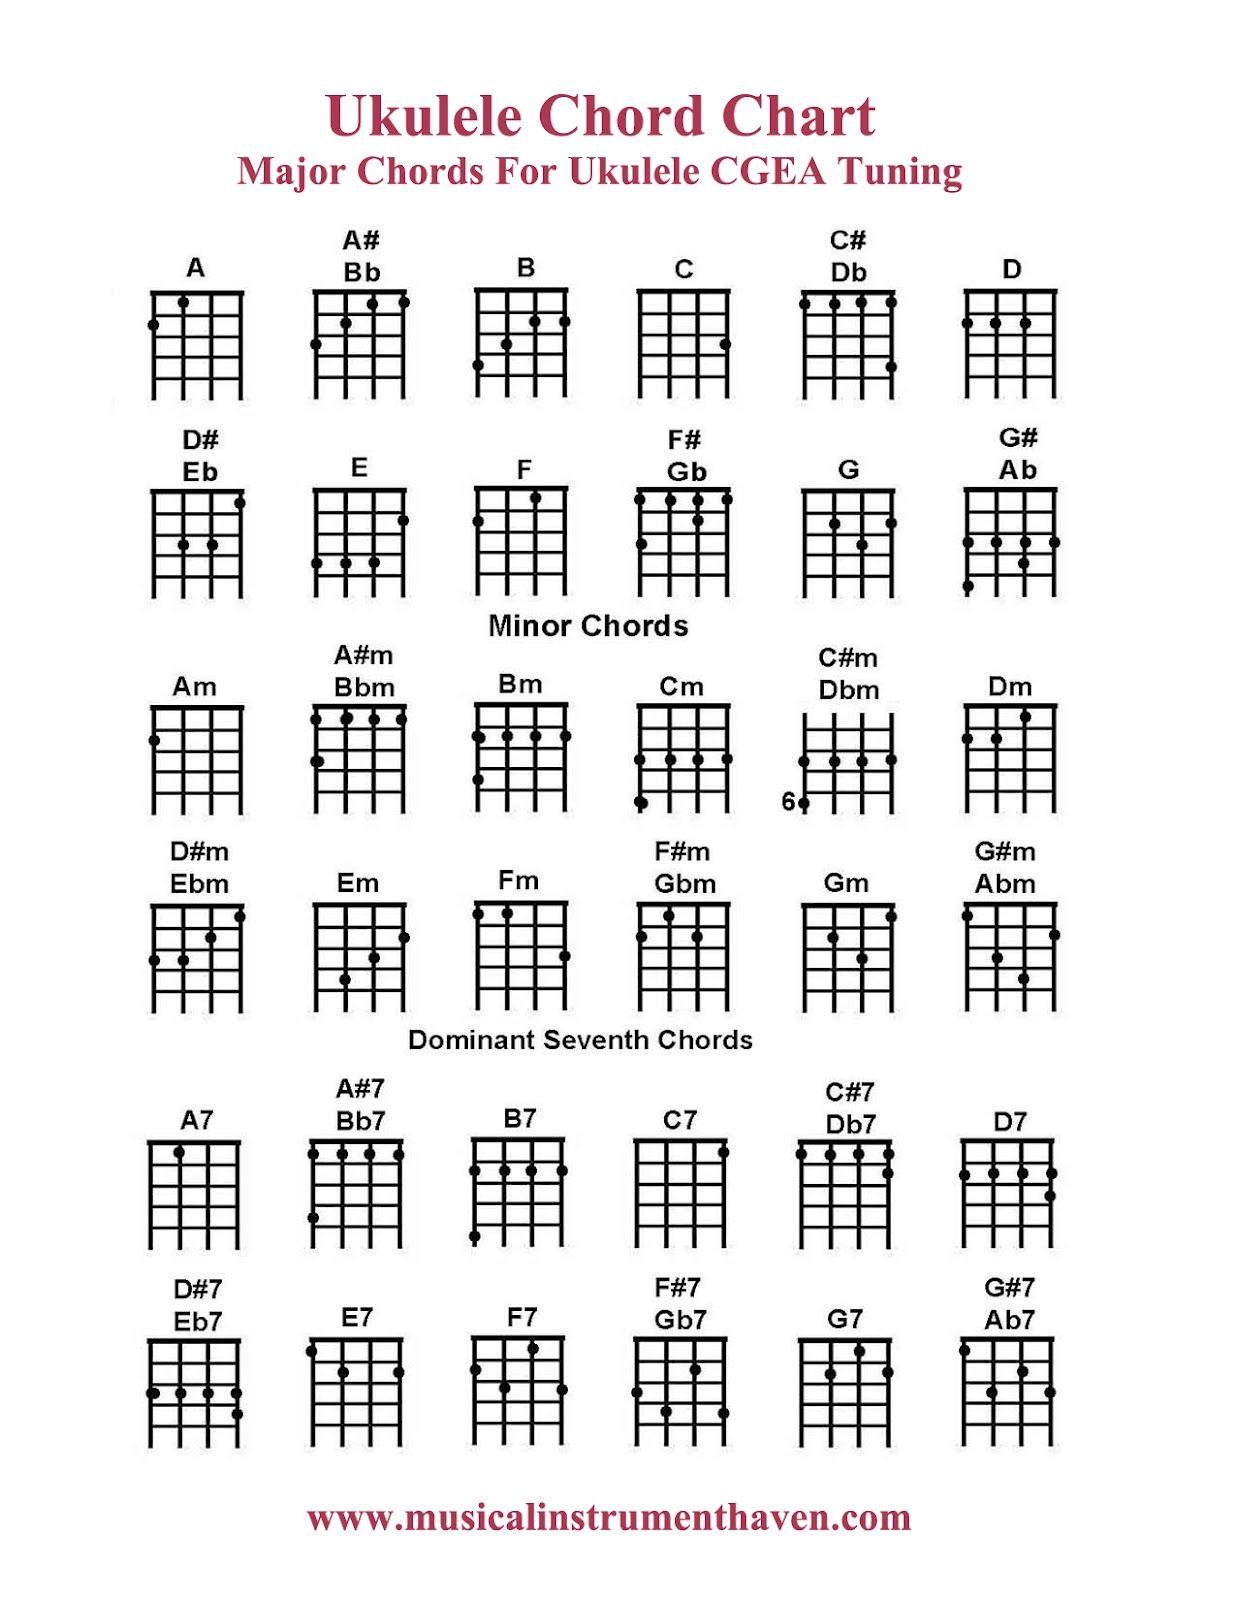 graphic relating to Ukulele Chord Chart Printable identify b\u003eUkulele\u003c\/b\u003e \u003cb\u003eChord\u003c\/b\u003e Chart - Main \u003cb\u003eChords\u003c\/b\u003e CGEA